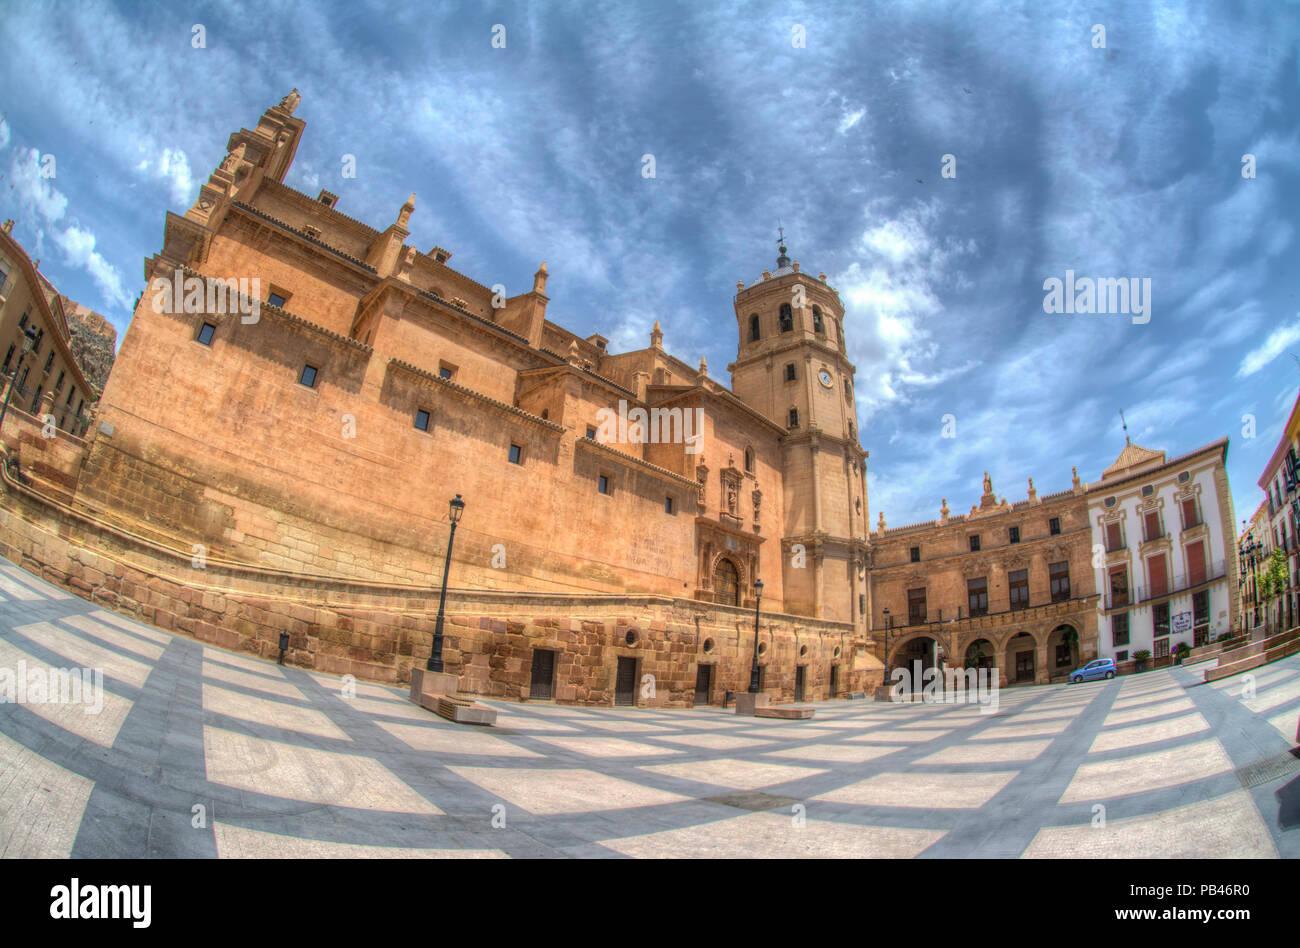 HDR image of the colegiata de San Patricio church in the plaza de espana in Lorca Murcia Spain - Stock Image